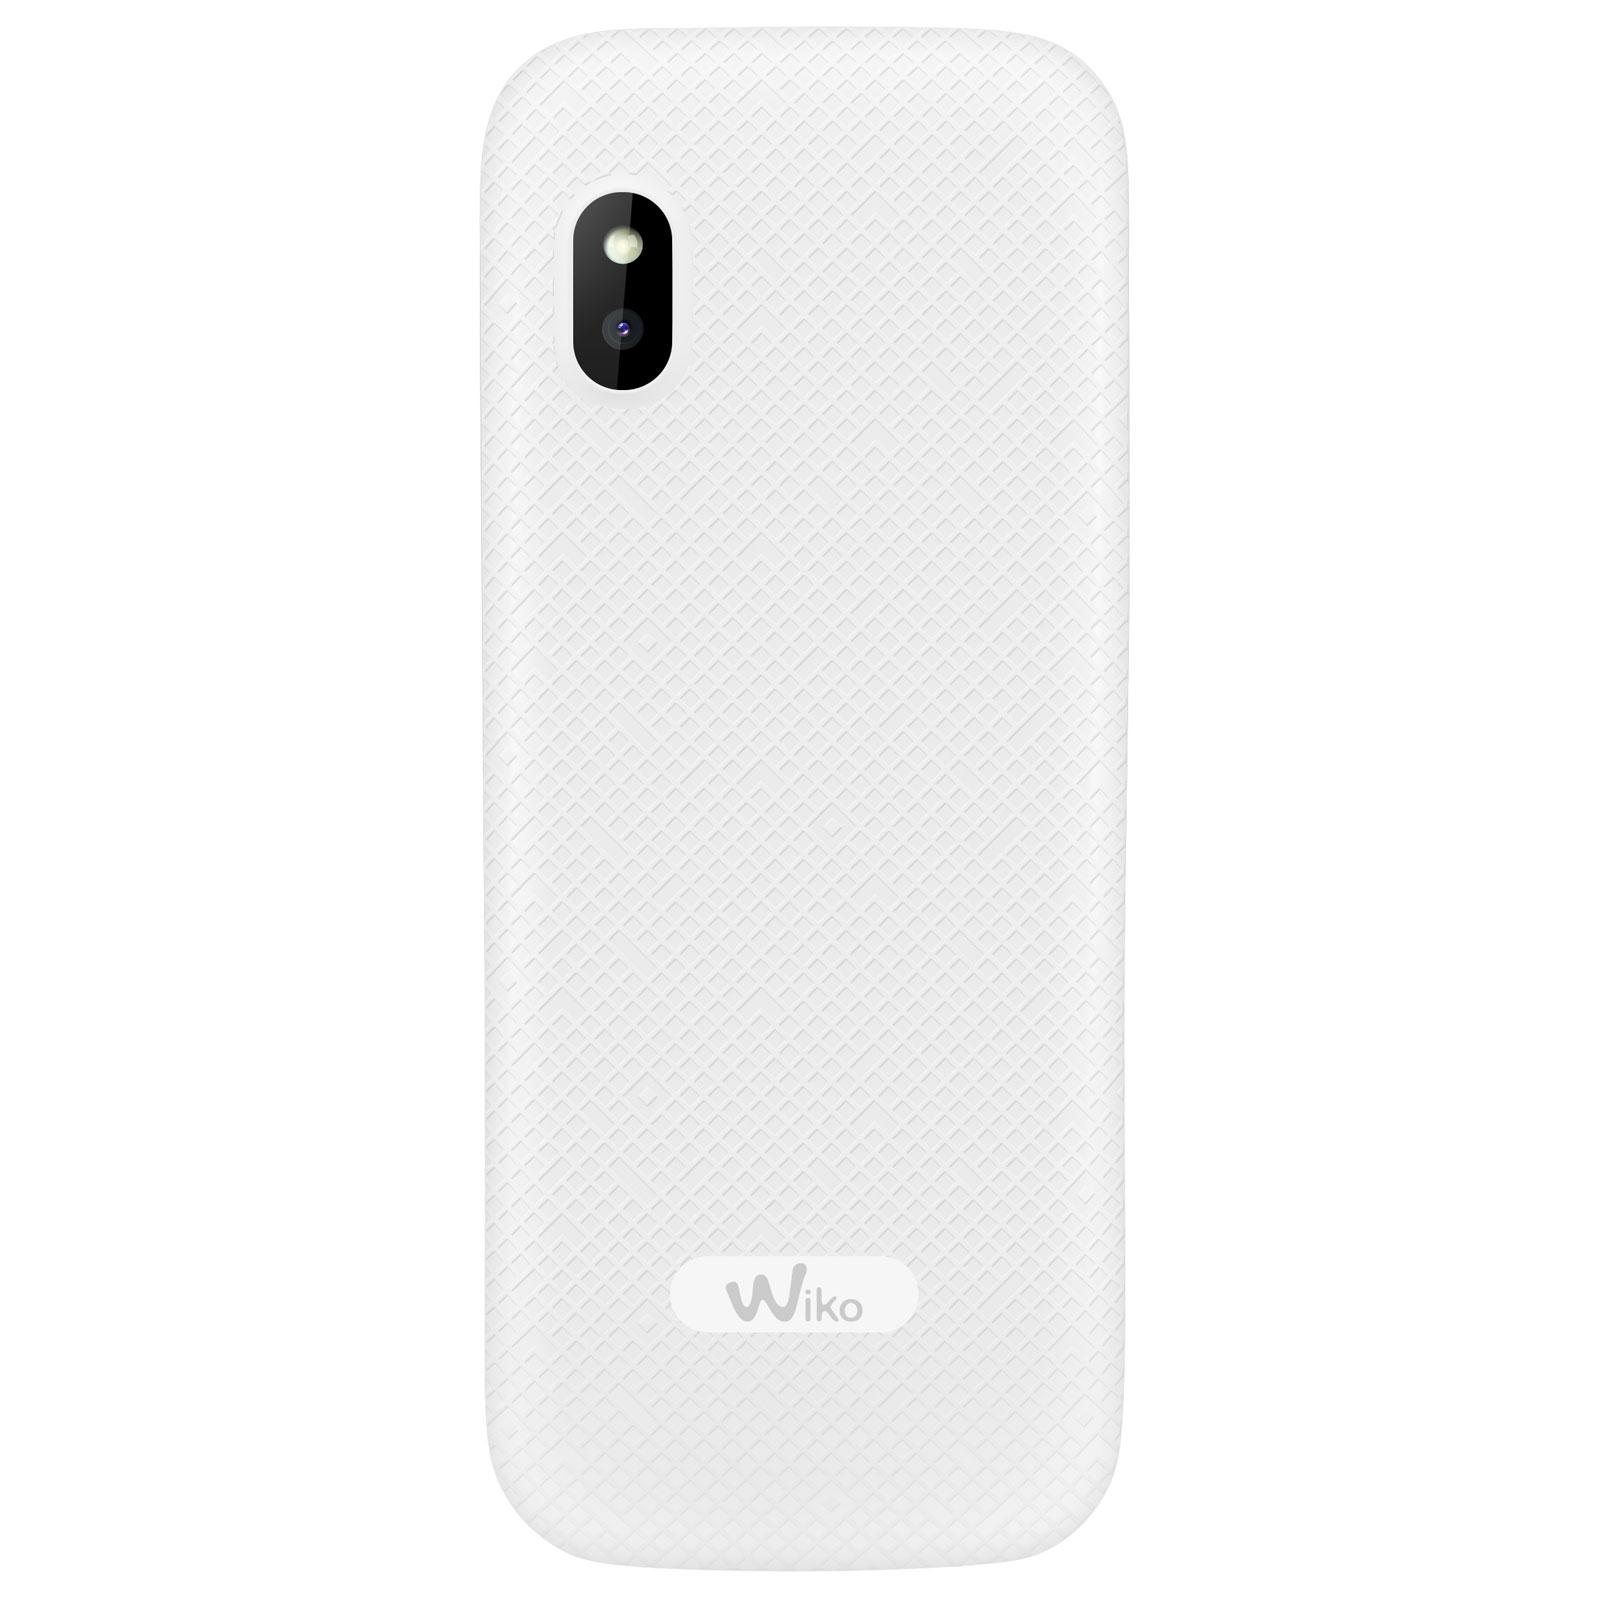 wiko lubi 3 blanc mobile smartphone wiko sur. Black Bedroom Furniture Sets. Home Design Ideas